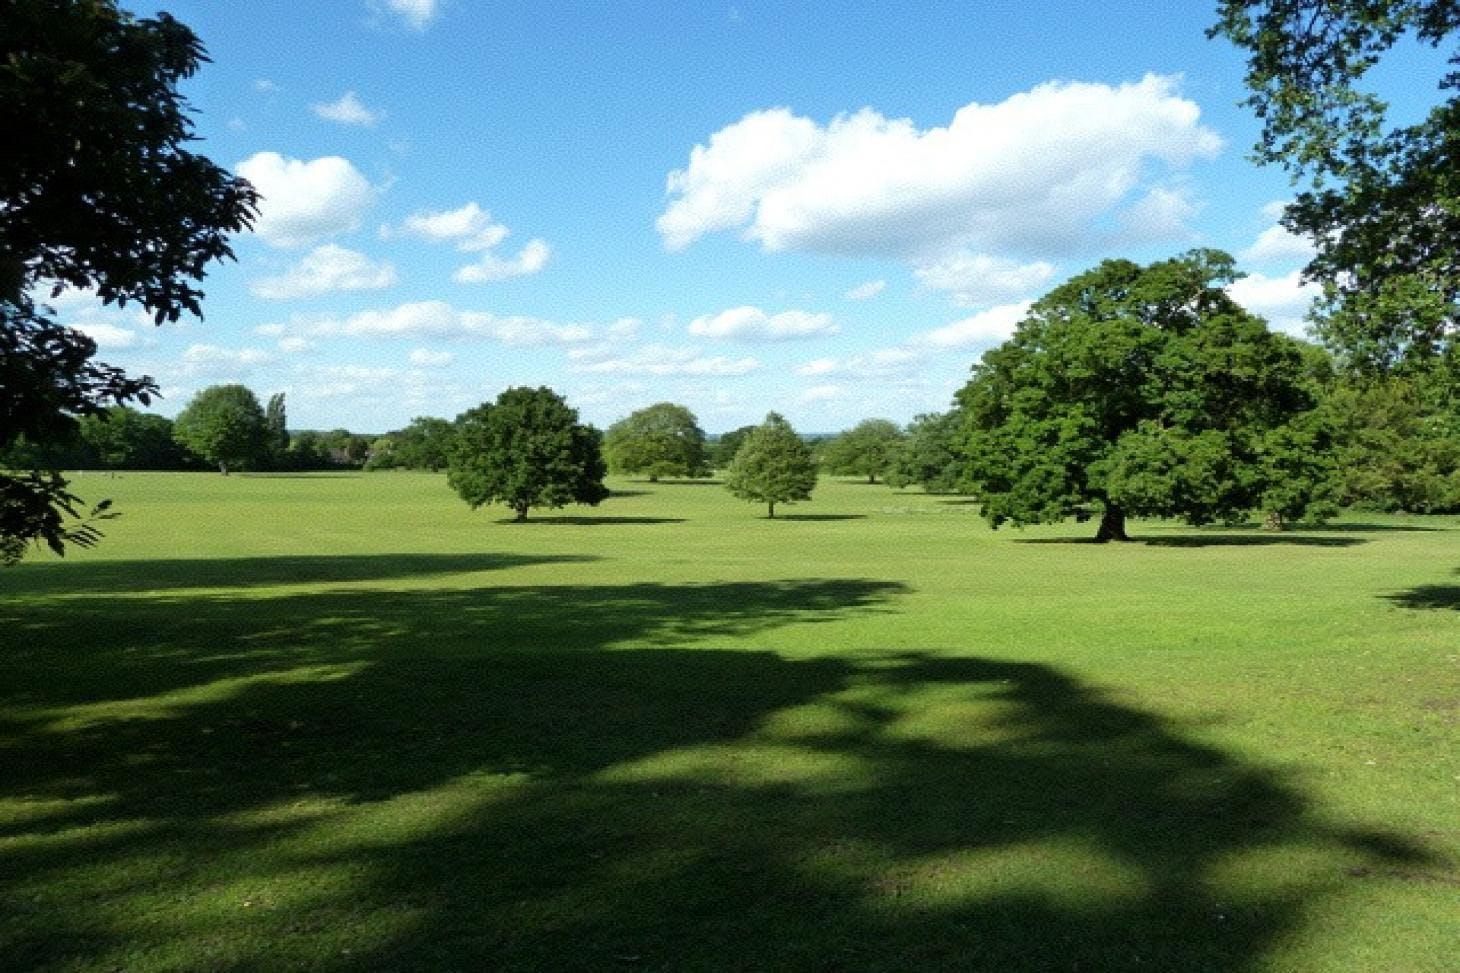 Hillingdon Court Park - Football 5 a side   Grass football pitch